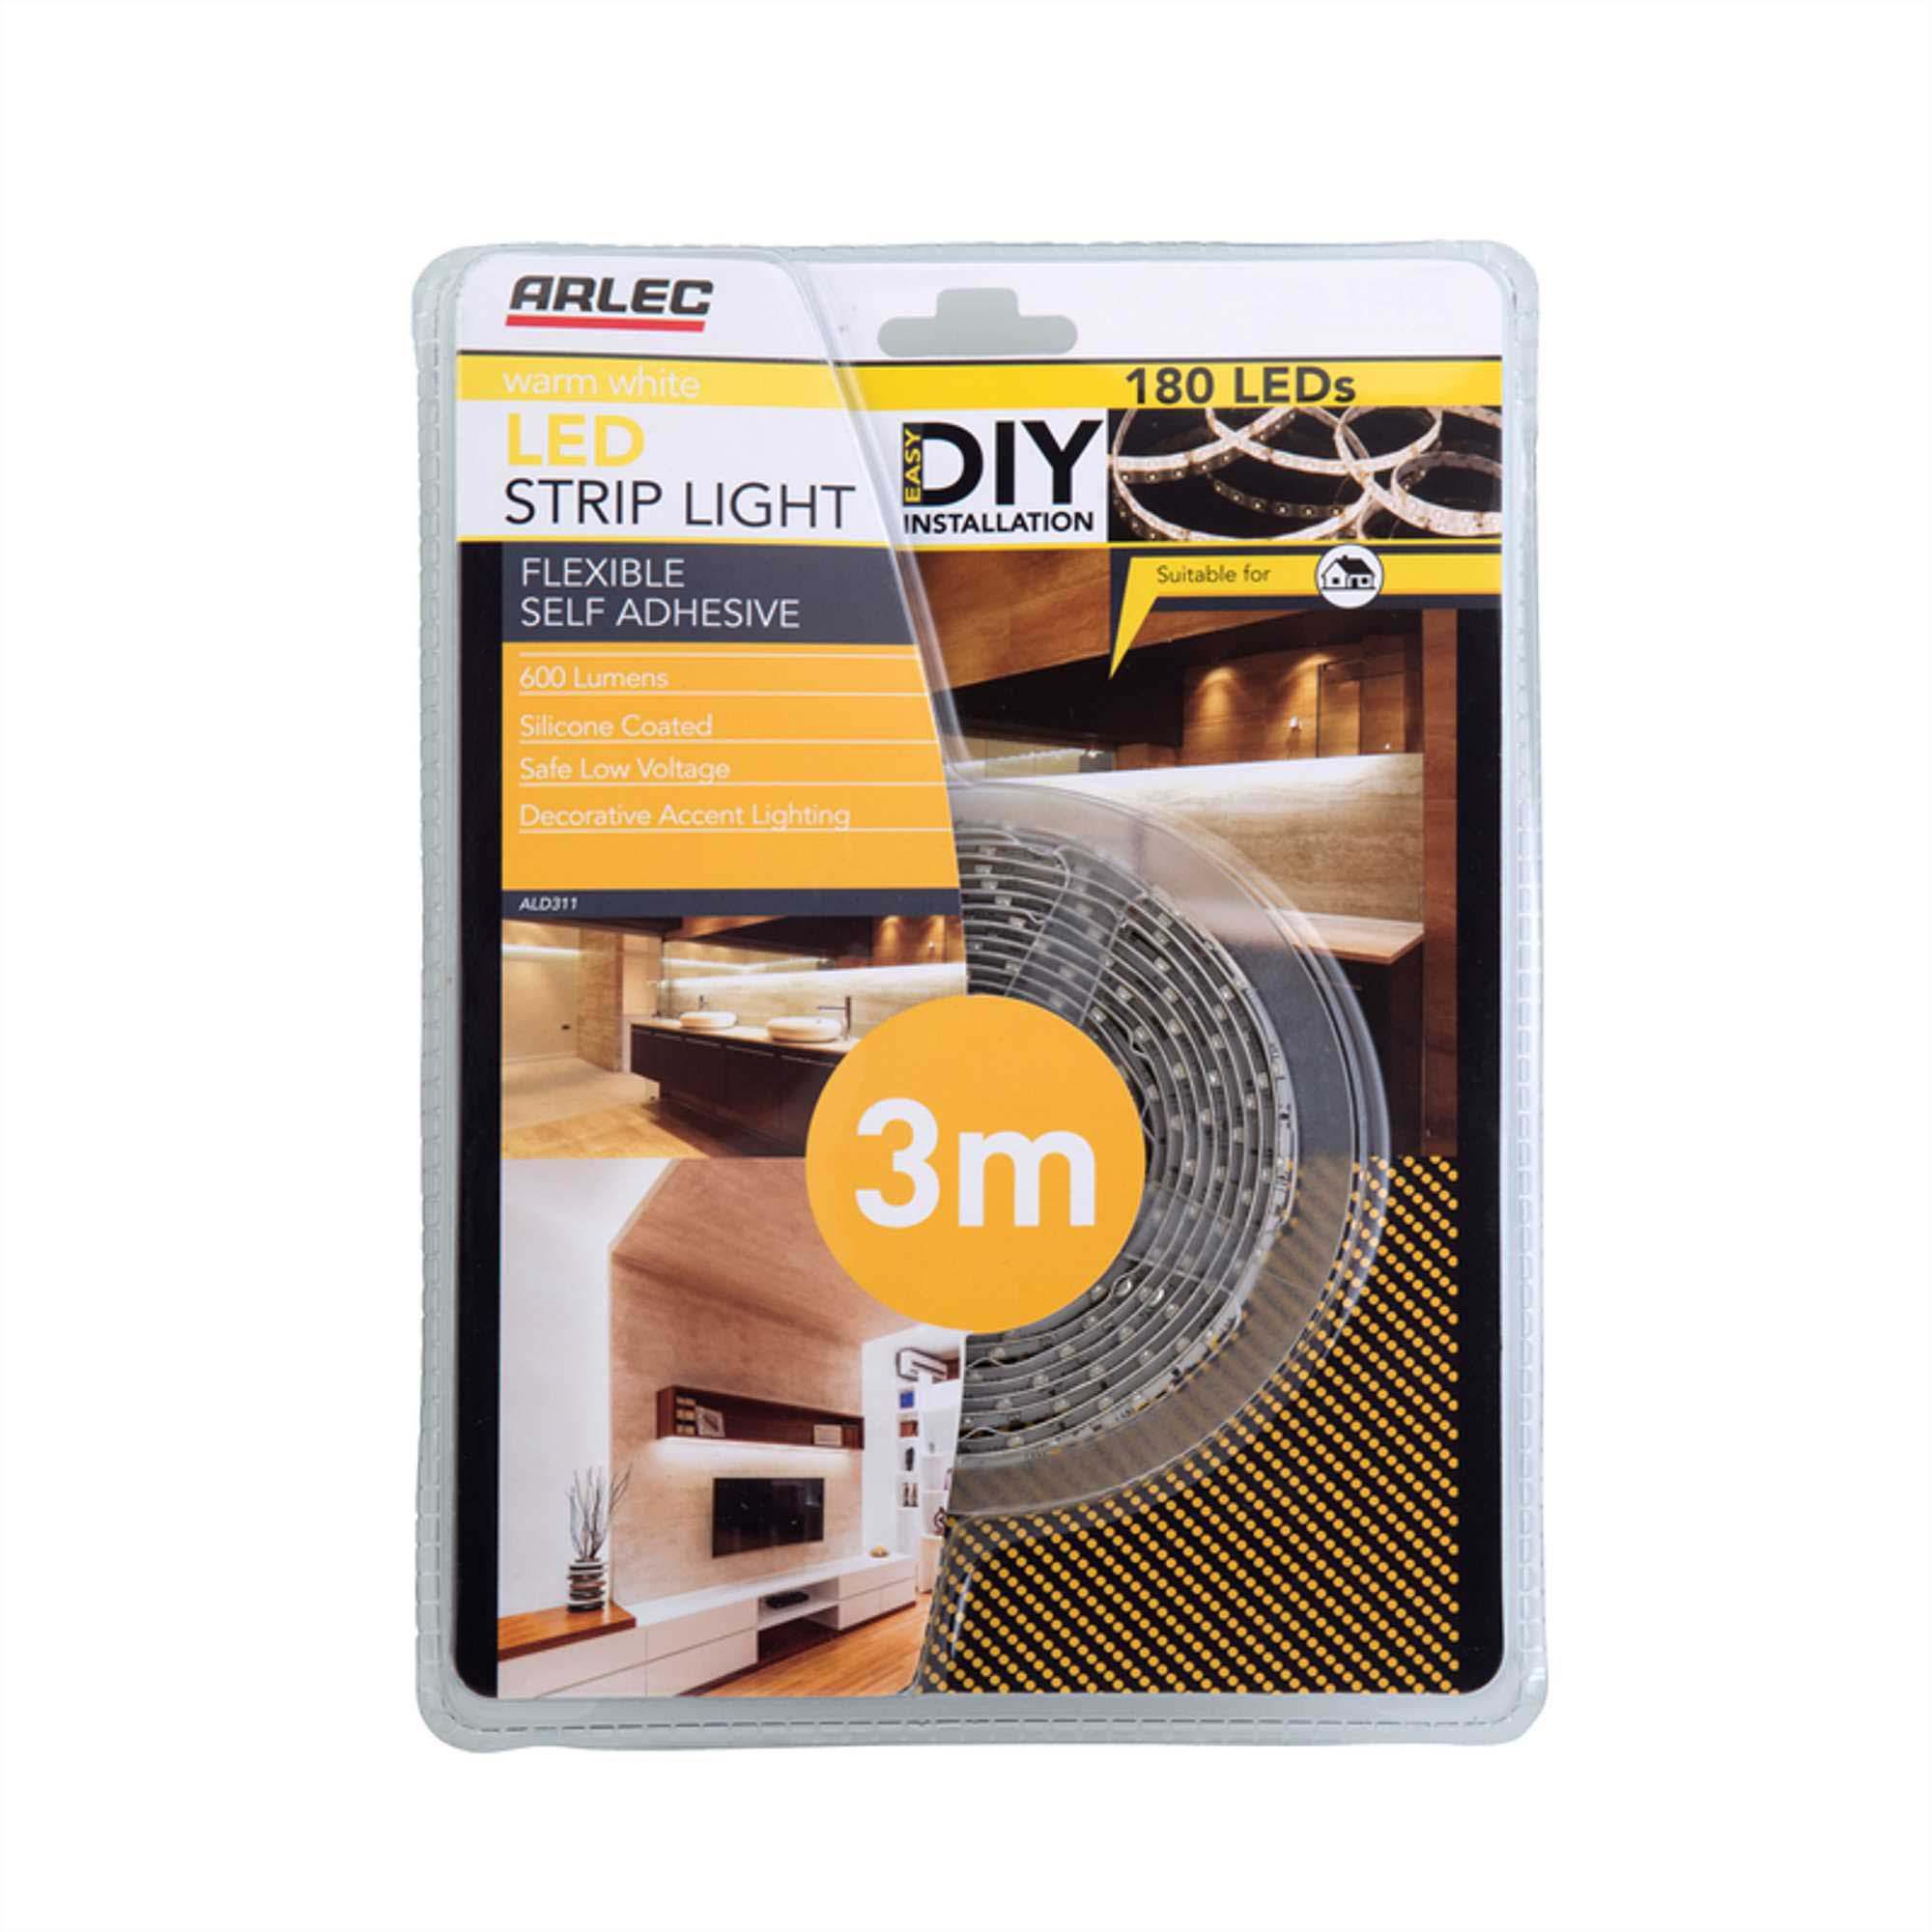 3m warm white silicone coated led strip light